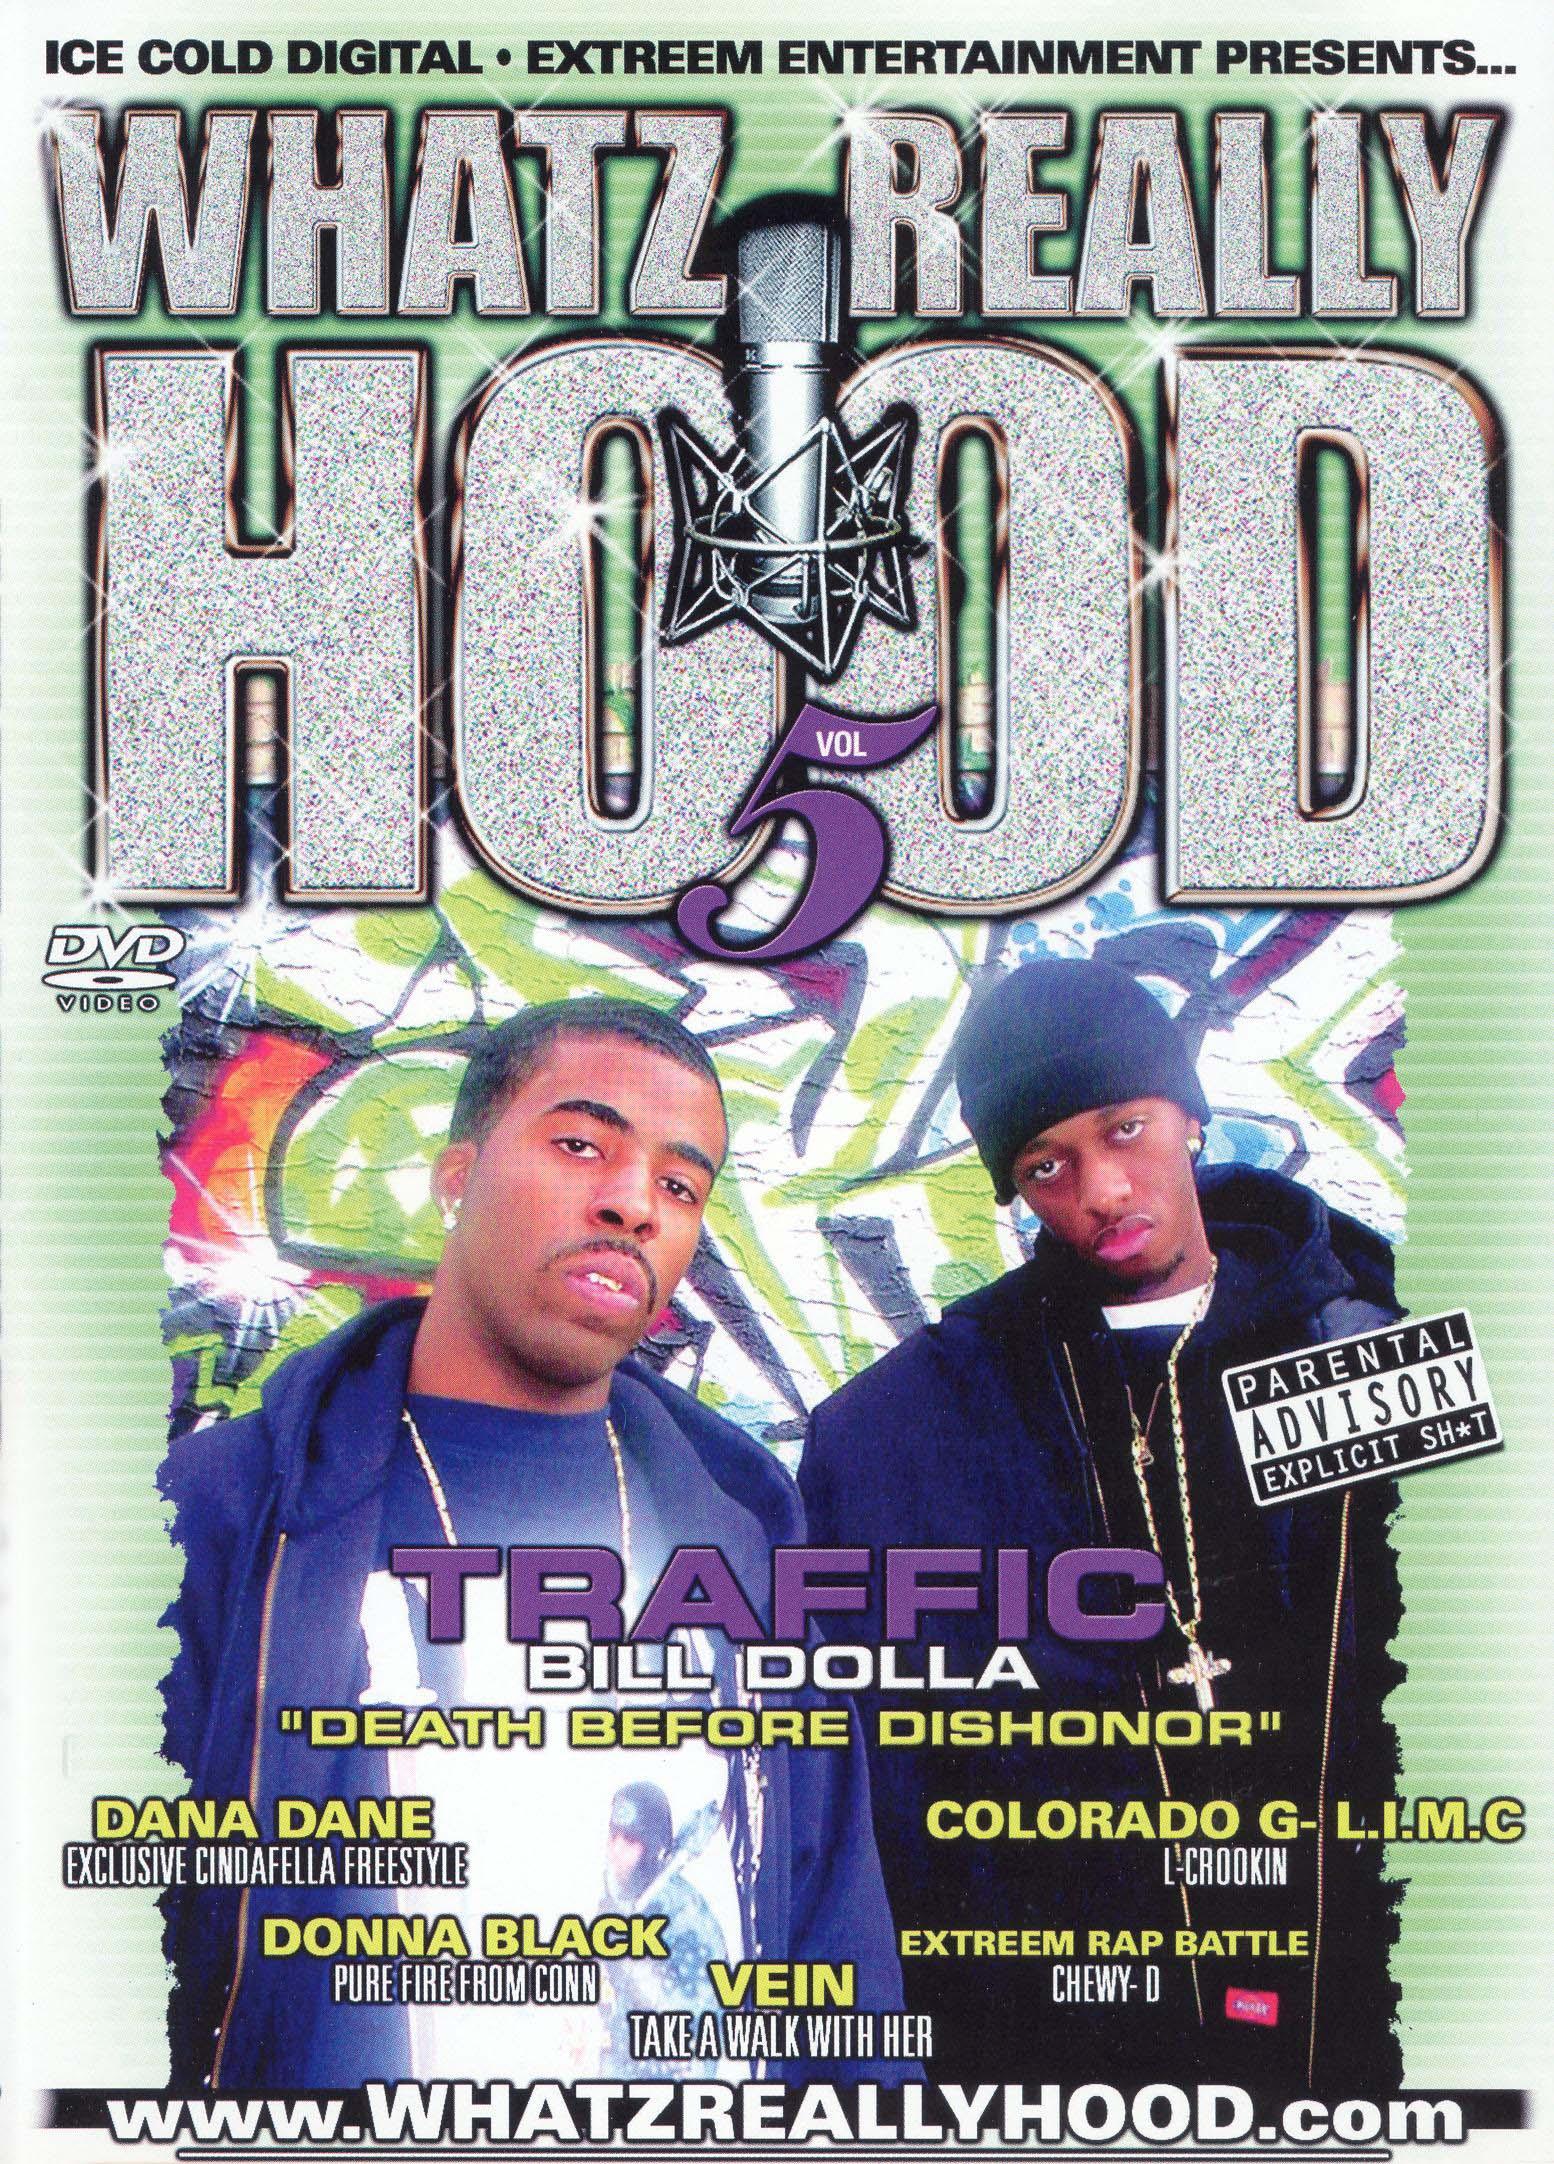 Whatz Really Hood, Vol. 5